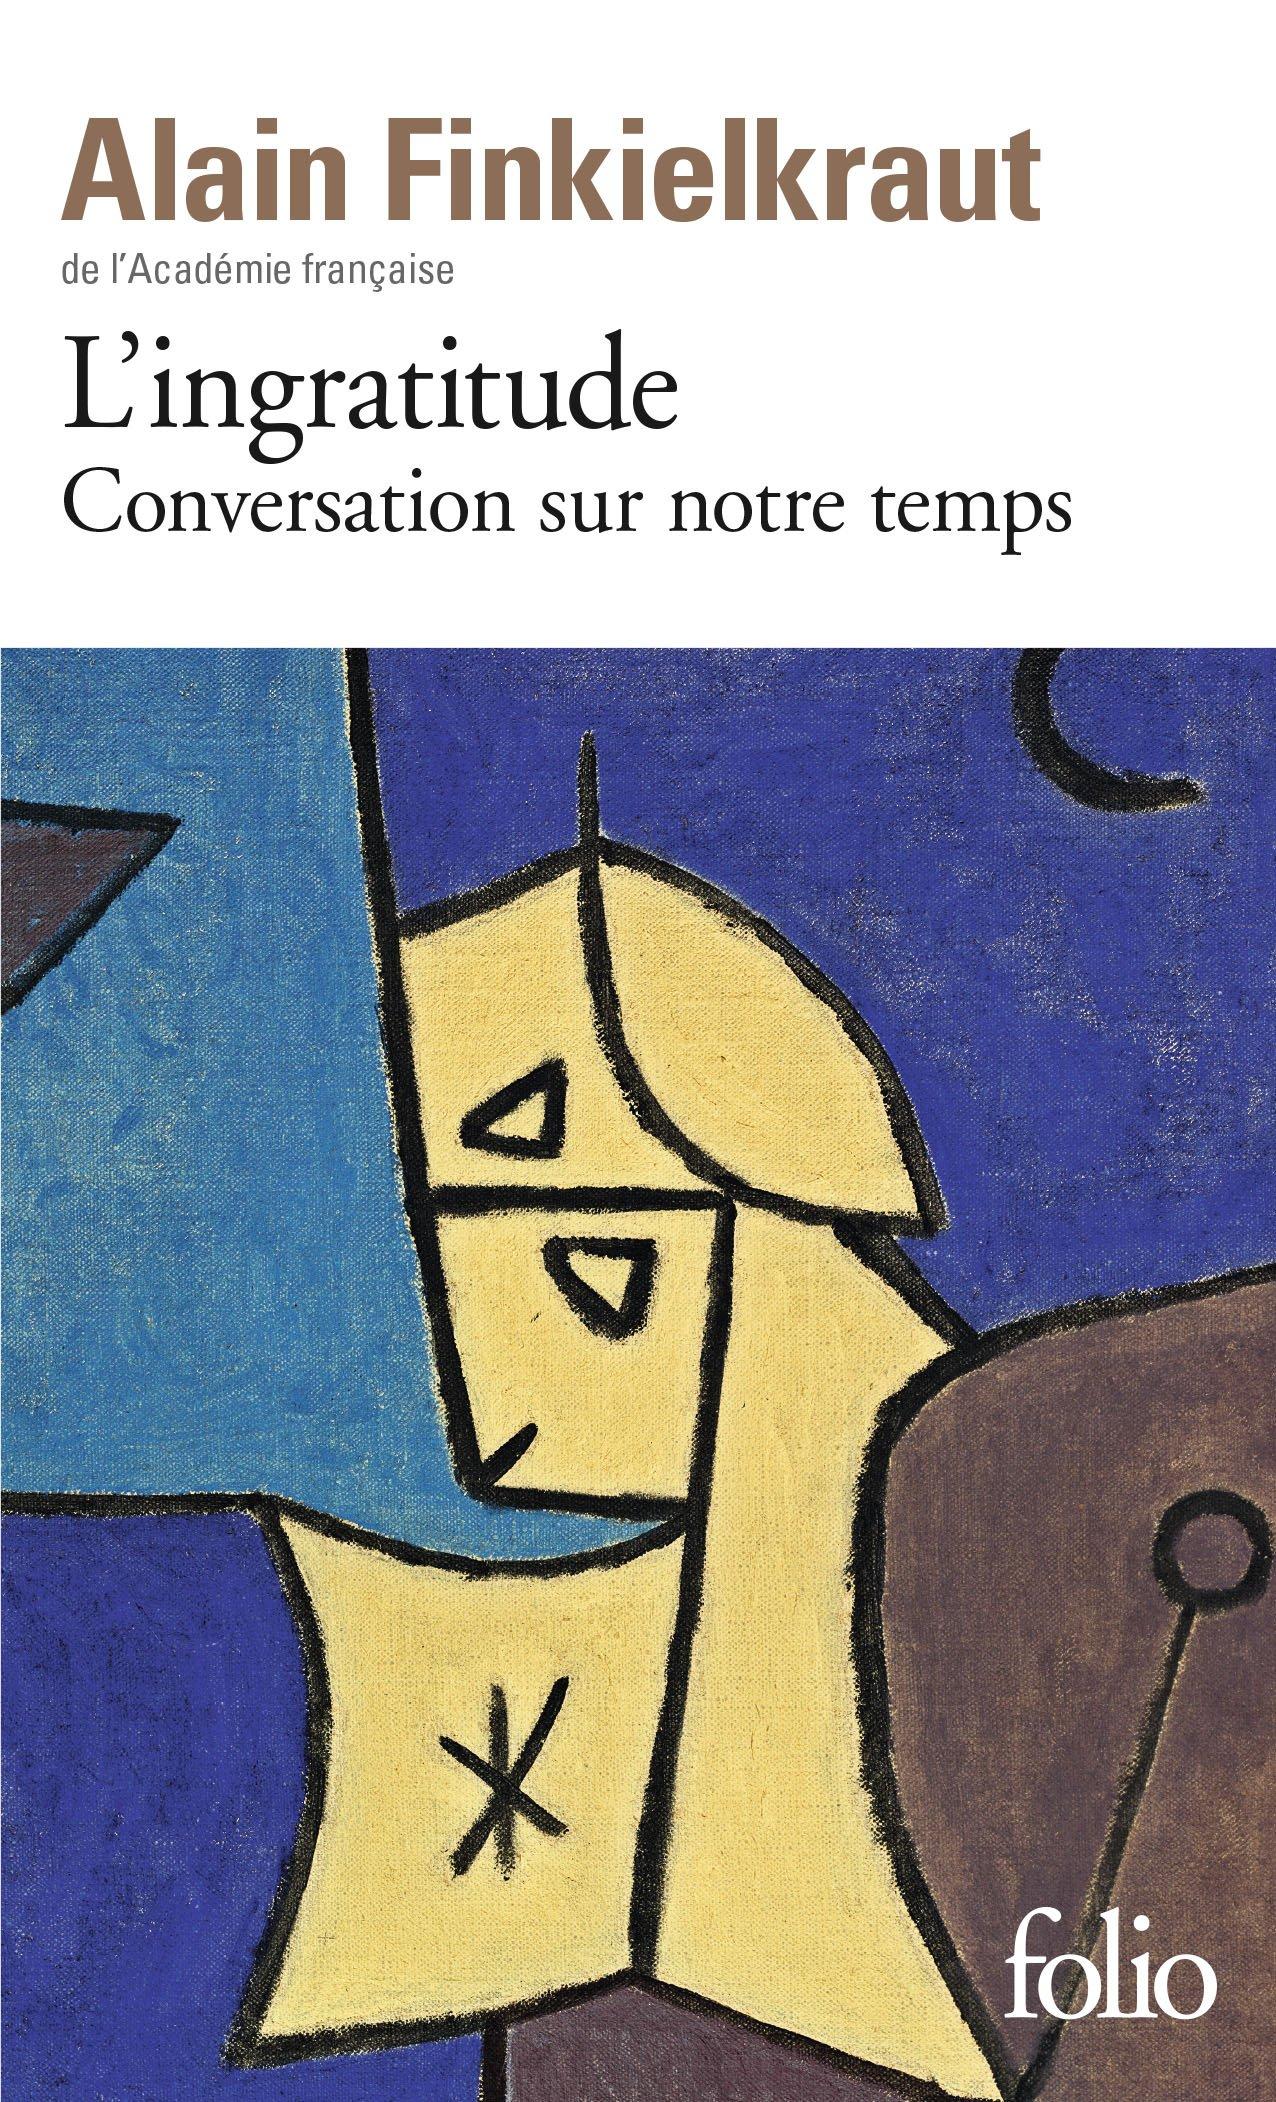 LIngratitude: Conversation sur notre temps avec Antoine Robitaille Folio: Amazon.es: Alain Finkielkraut: Libros en idiomas extranjeros